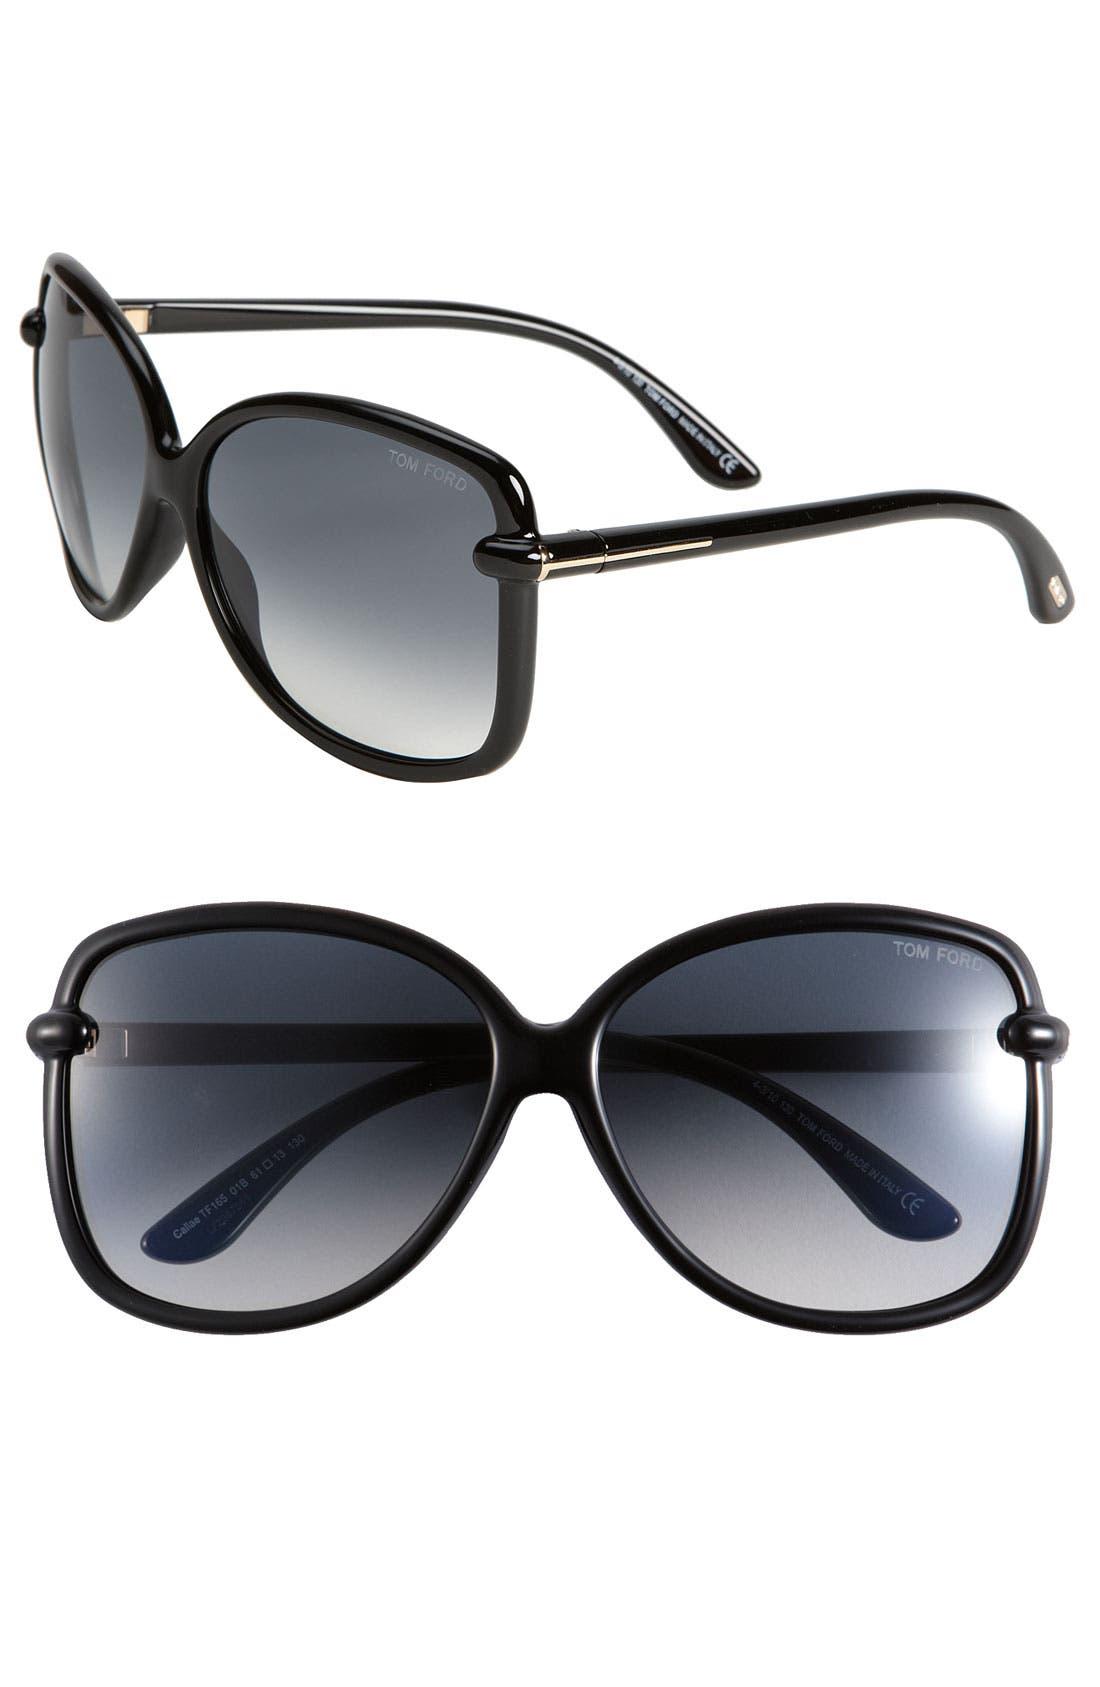 Alternate Image 1 Selected - Tom Ford 'Callae' Sunglasses